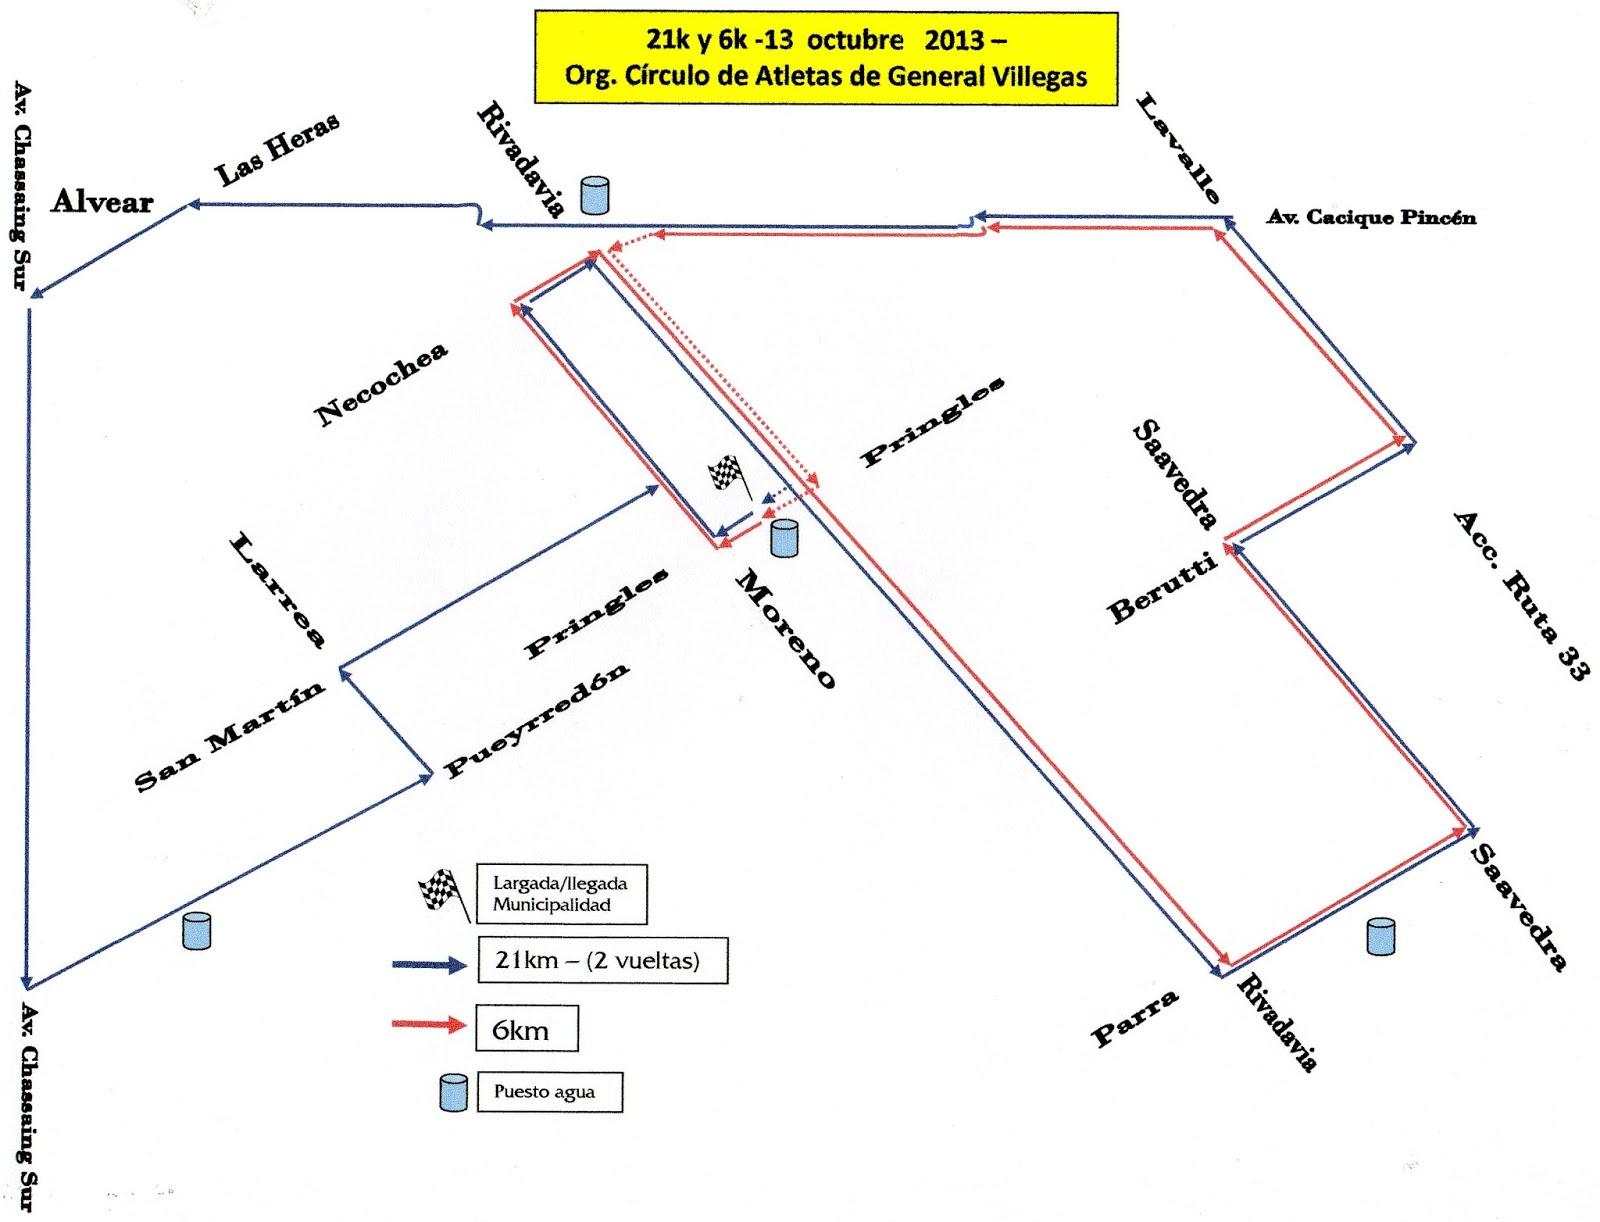 Circuito General : Círculo de atletas de gral. villegas: 1º media maraton g.villegas